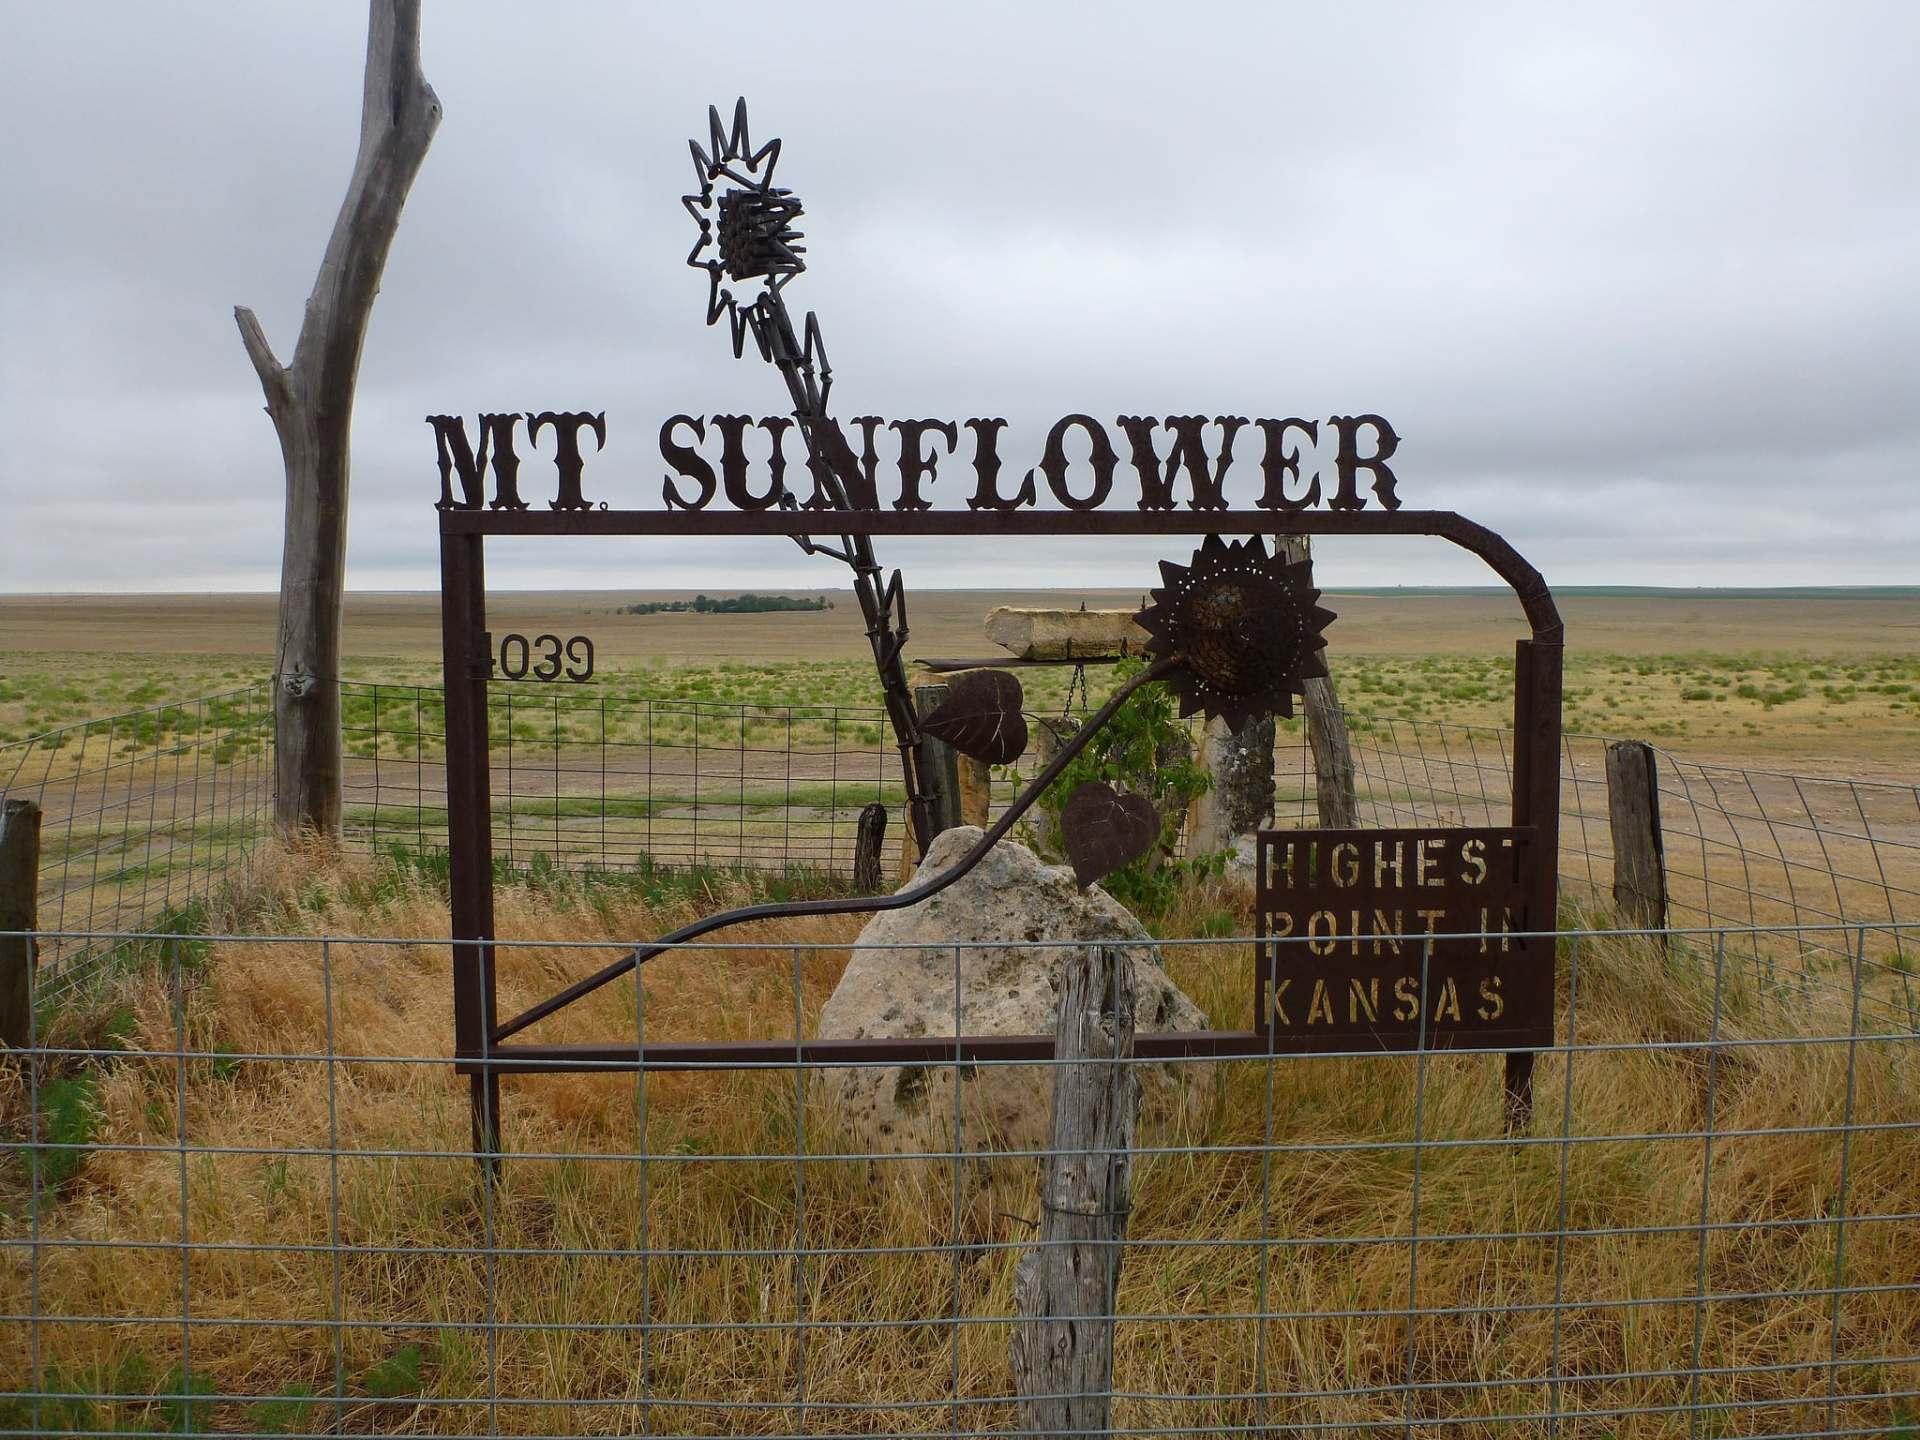 Mt Sunflower, Kansas high point